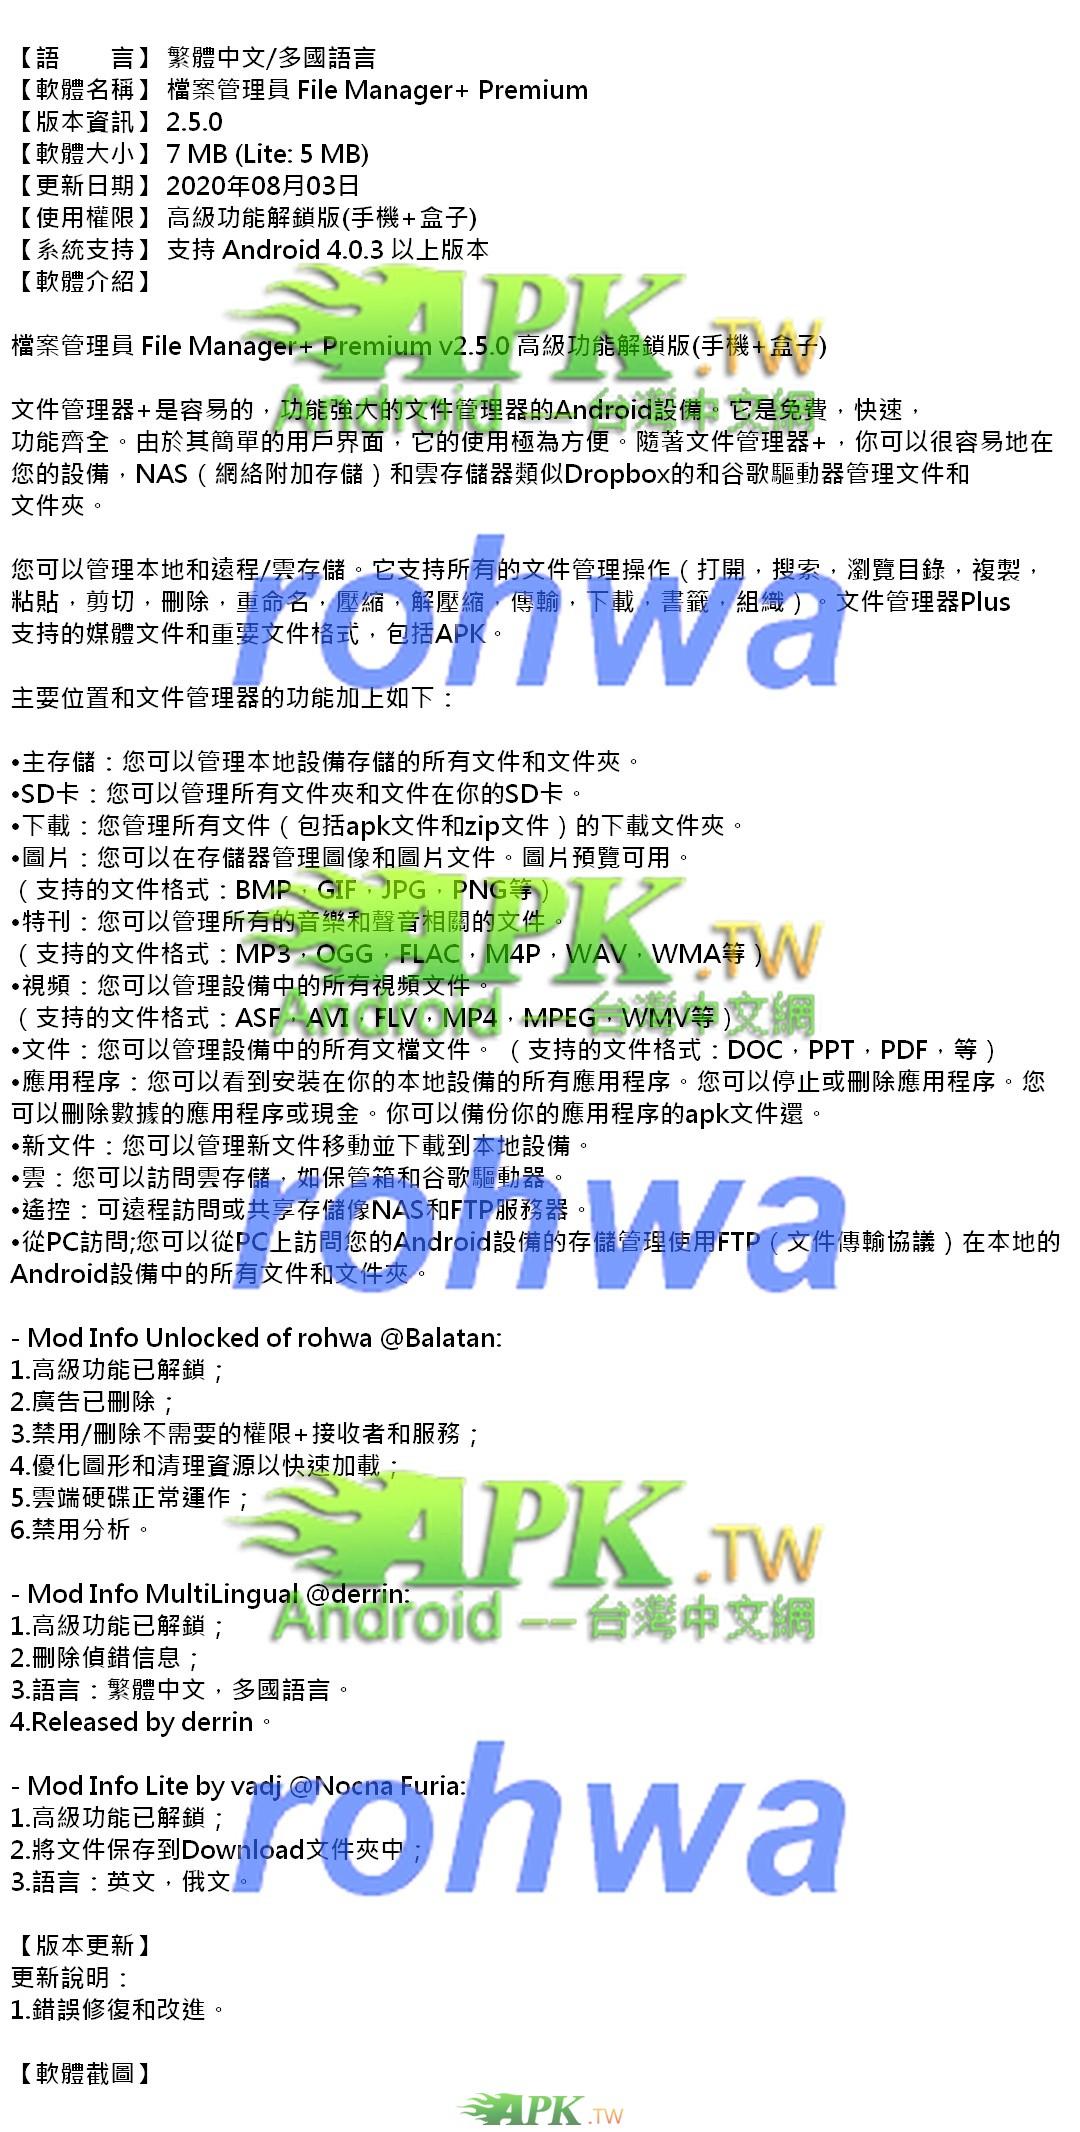 FileManager_Premium_2.5.0_.jpg